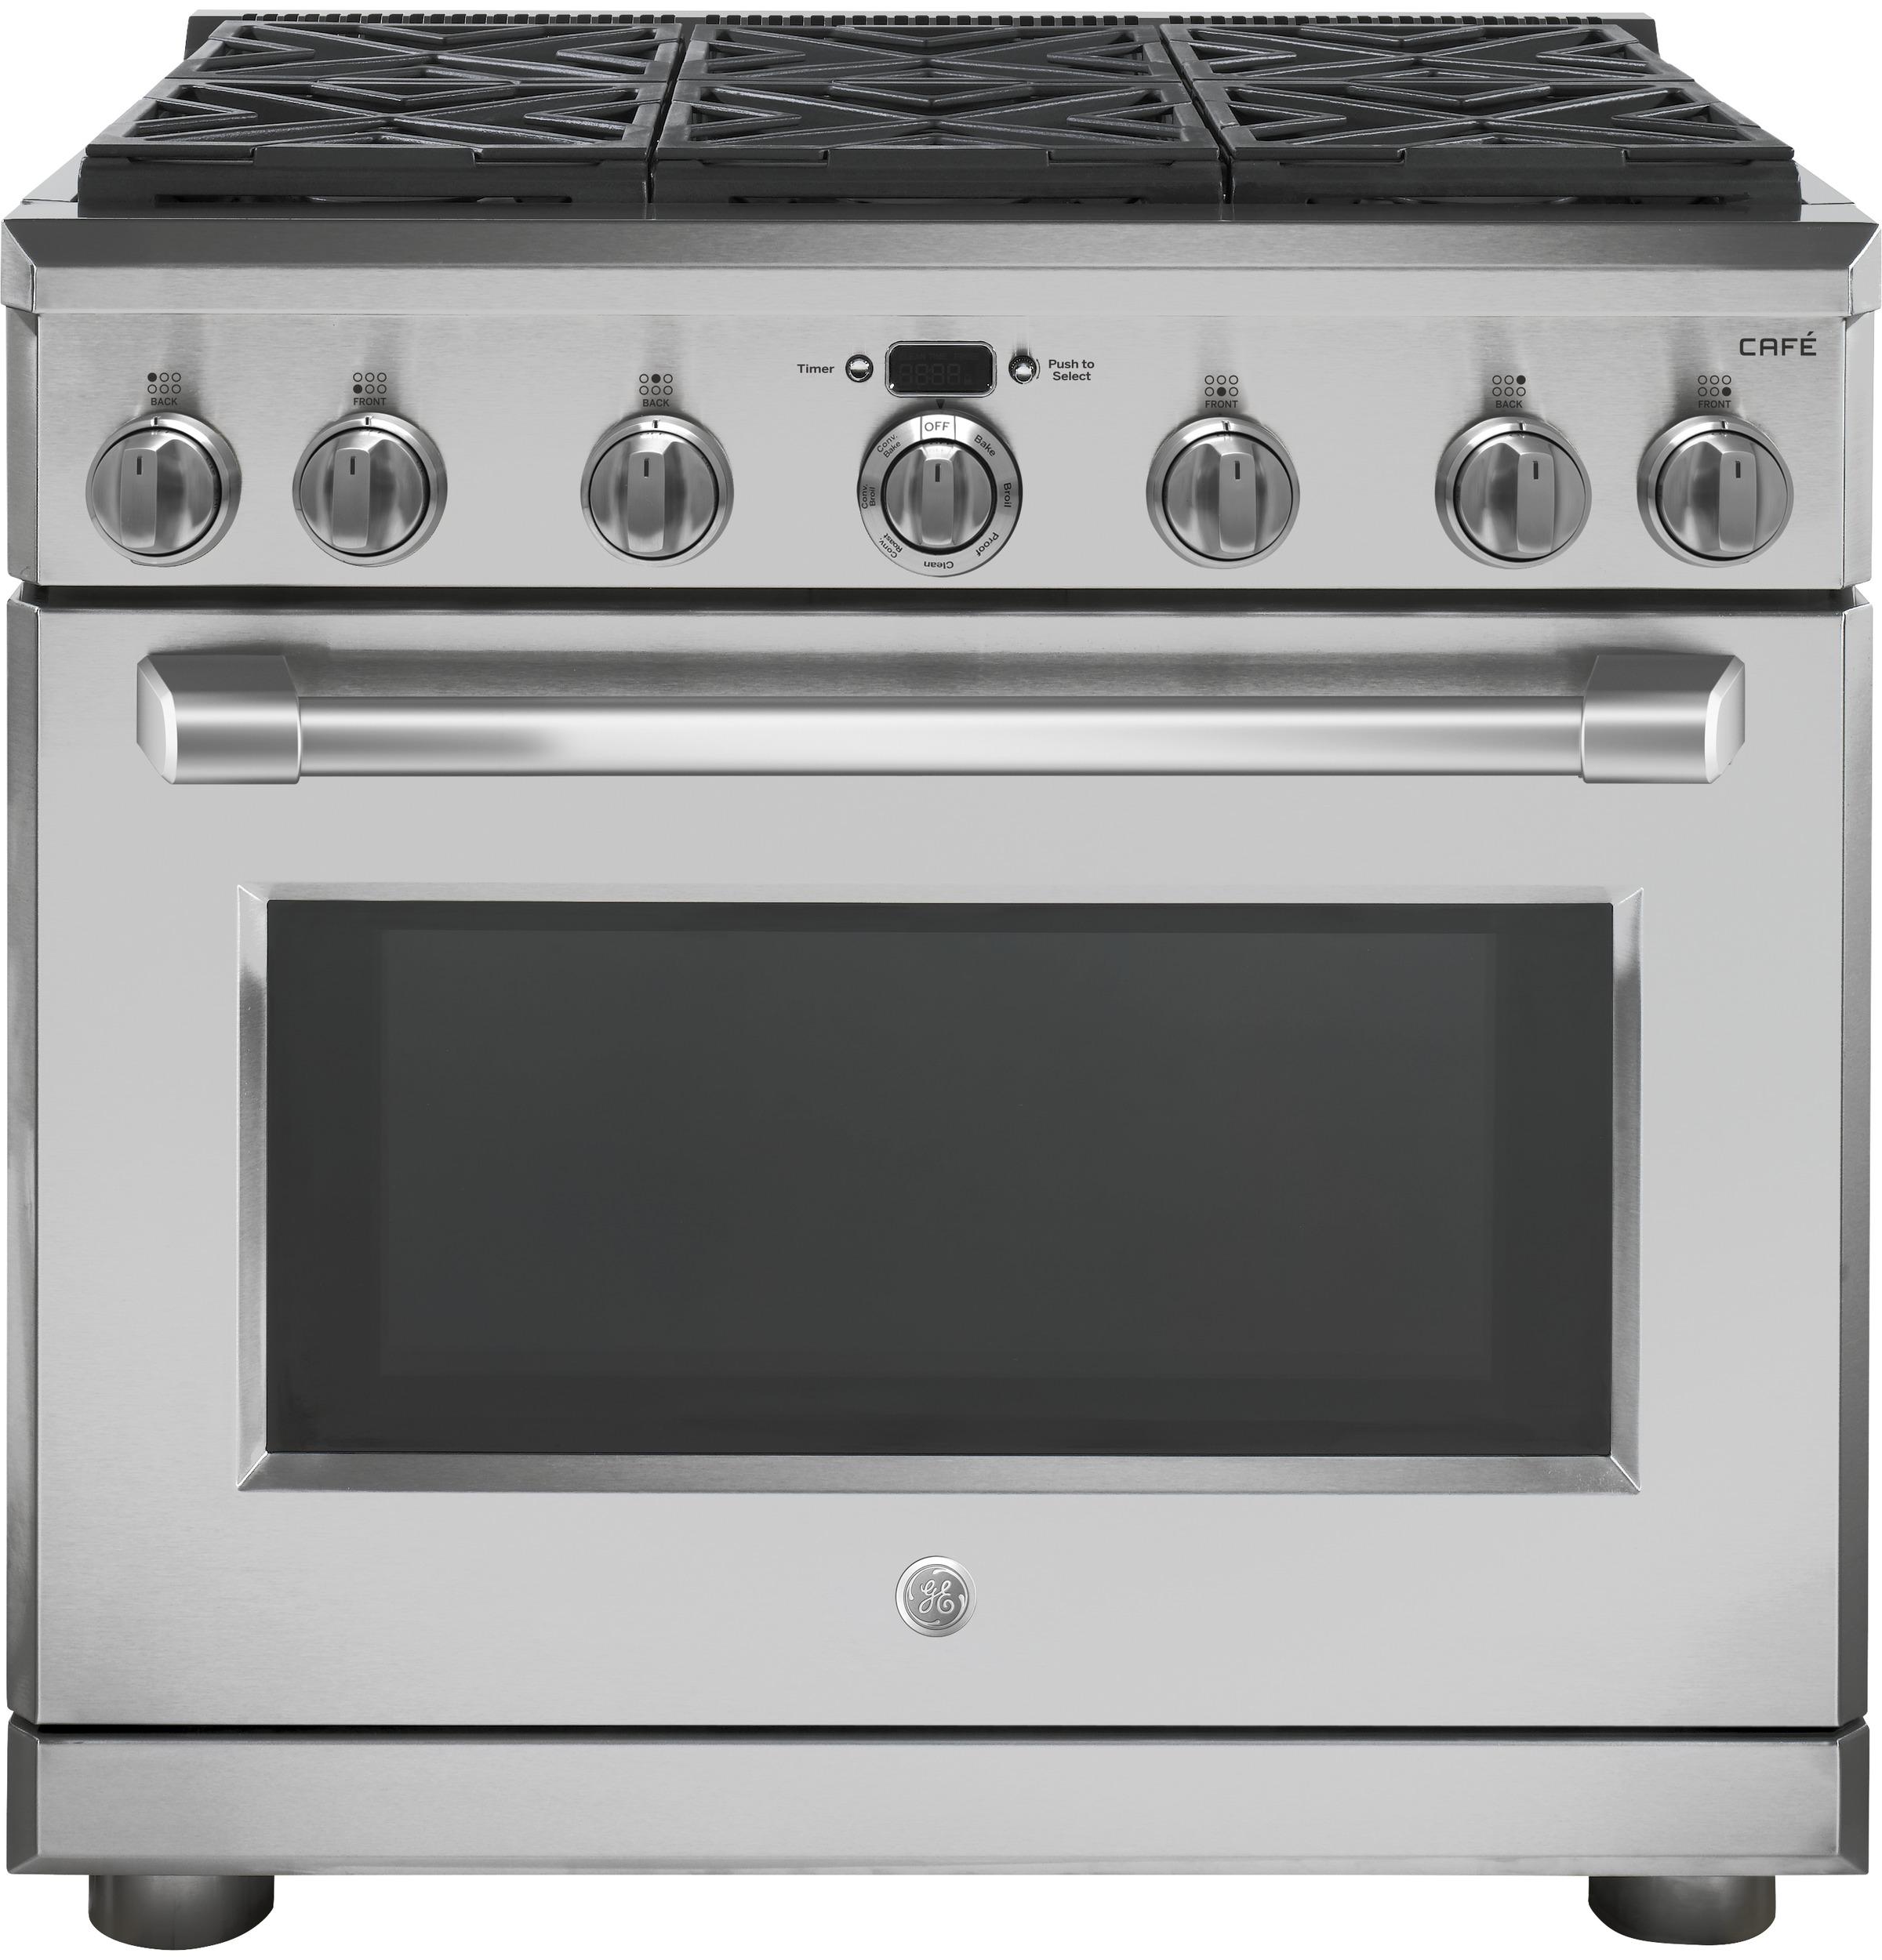 Pro Style Gas Range Home Appliances, Kitchen Appliances in New Hope ...